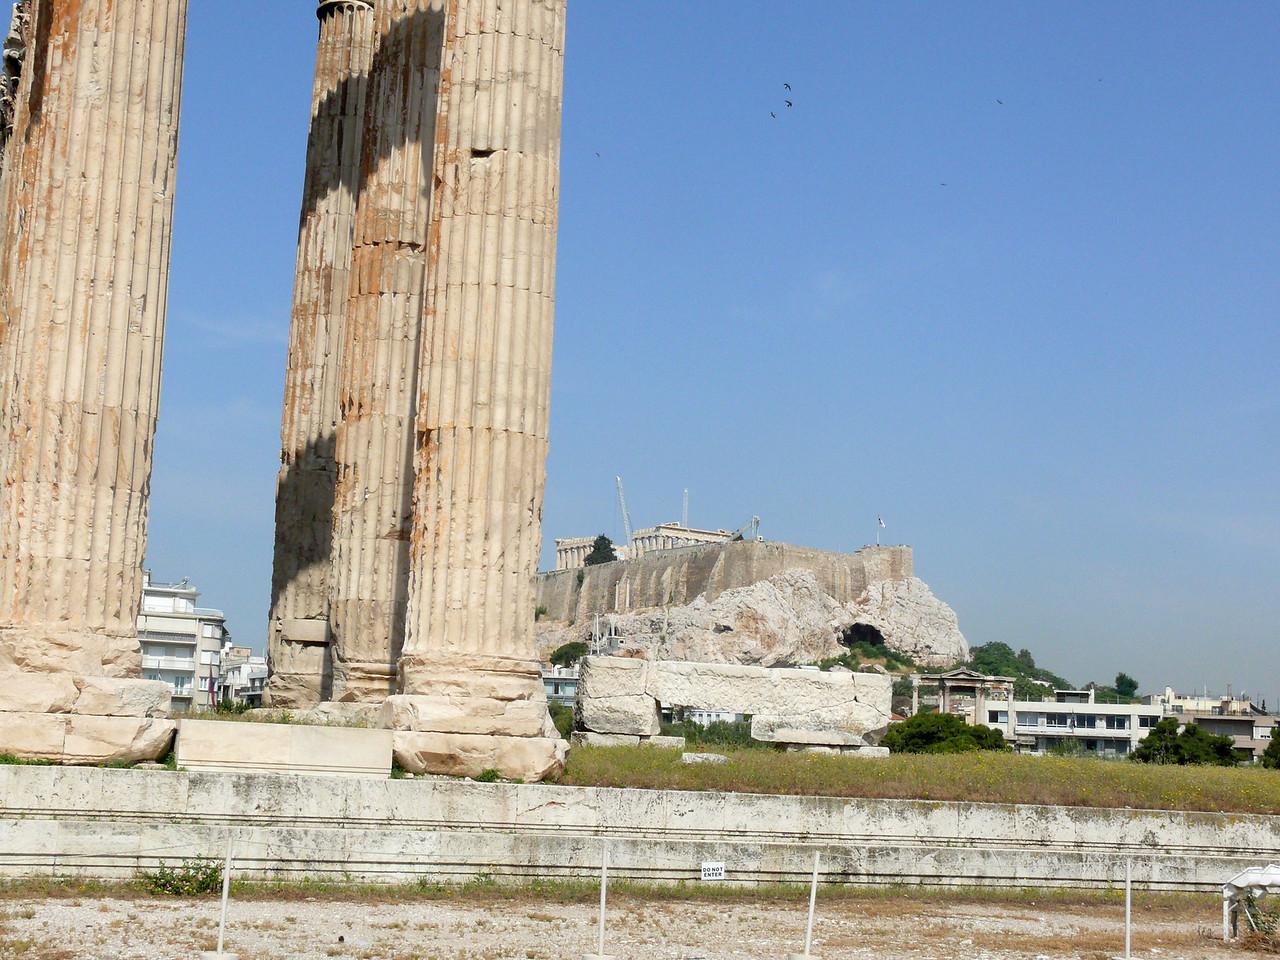 102_793 Greece Acropolis from Temple of Olympian Zeuss